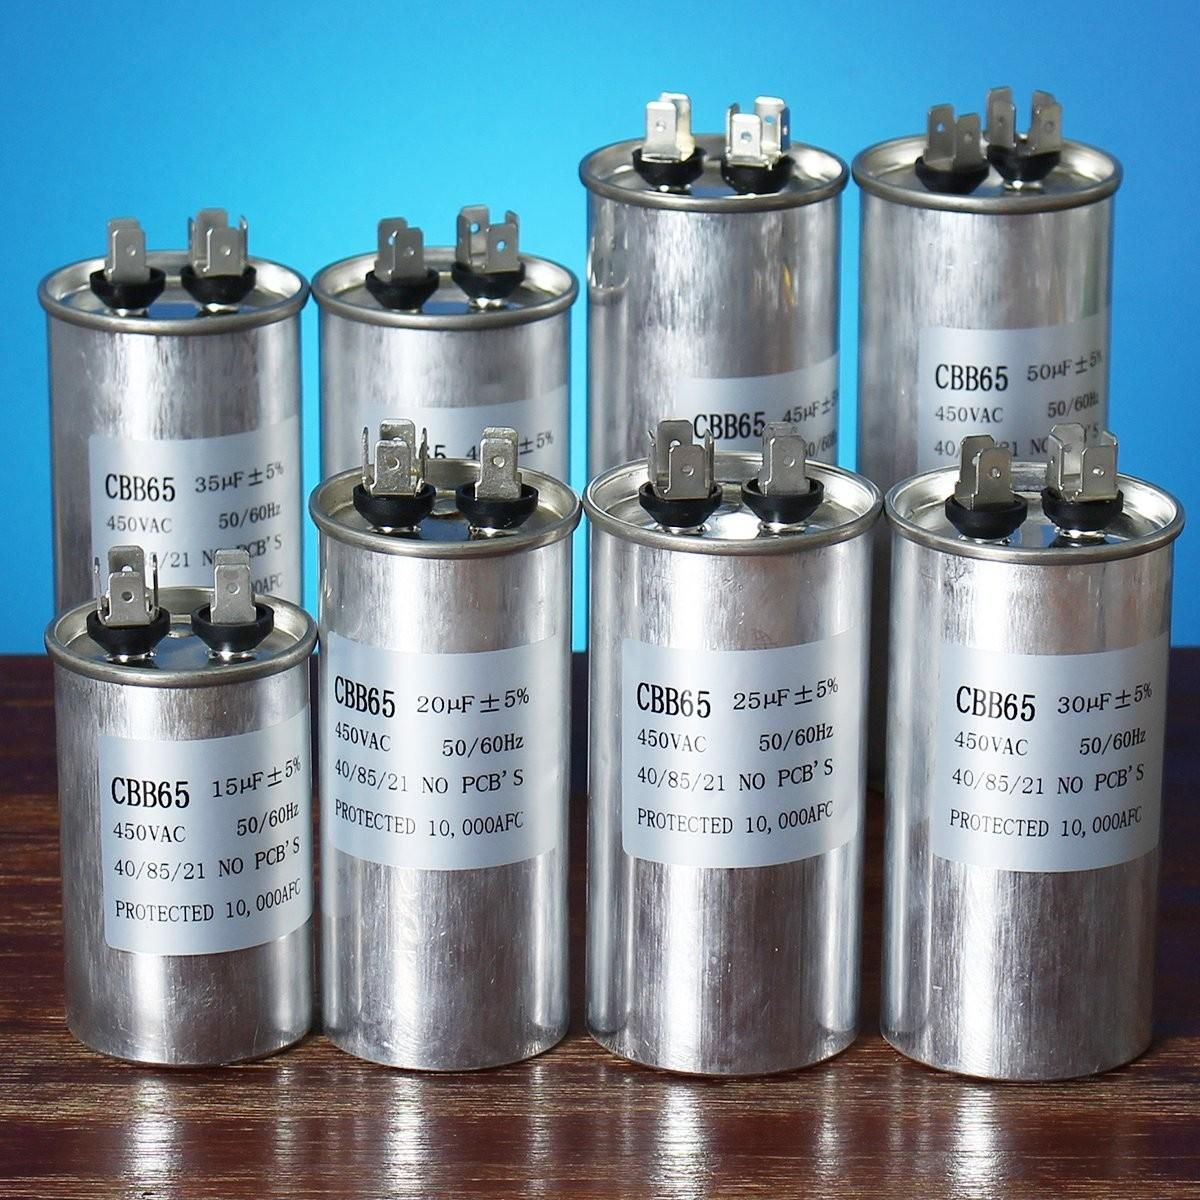 15 50uf Motor Capacitor Cbb65 450vac Air Conditioner Compressor Start Capacitor Electronic Accessories Supplies From Electronic Components Supplies On Bangg Air Conditioner Compressor Capacitor Electronic Accessories